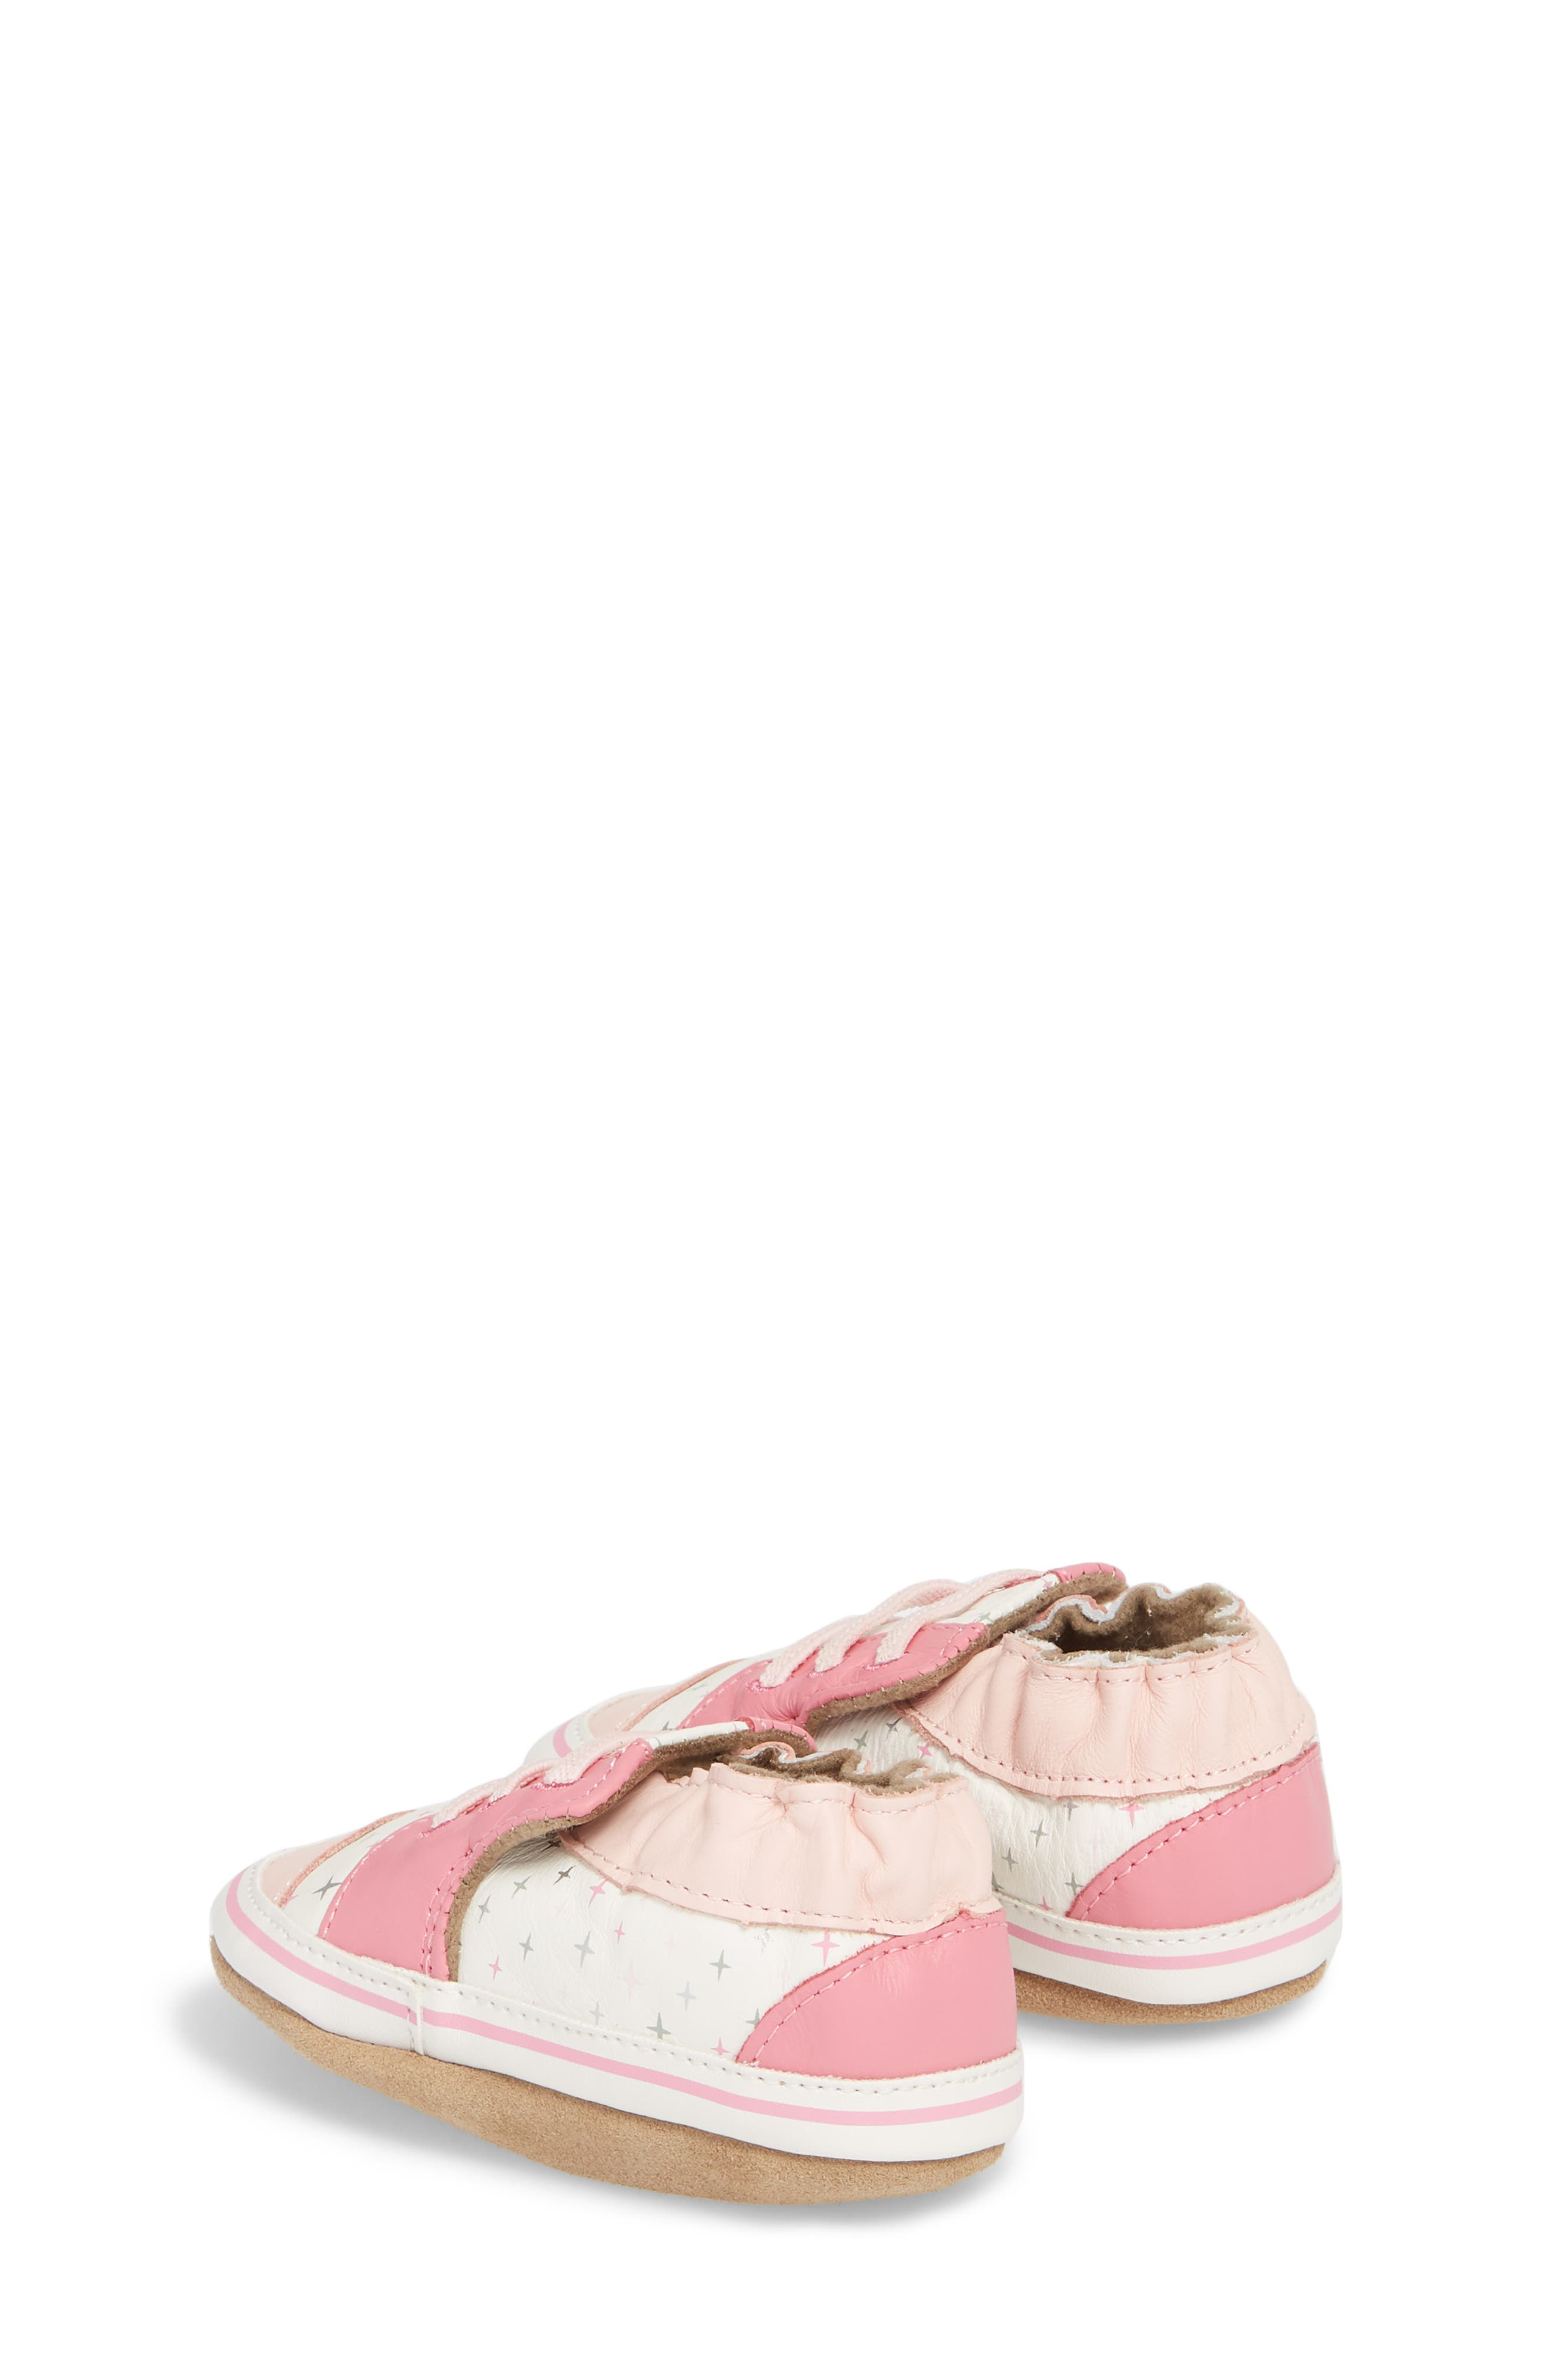 Alternate Image 2  - Robeez® Trendy Trainer Sneaker Crib Shoe (Baby)